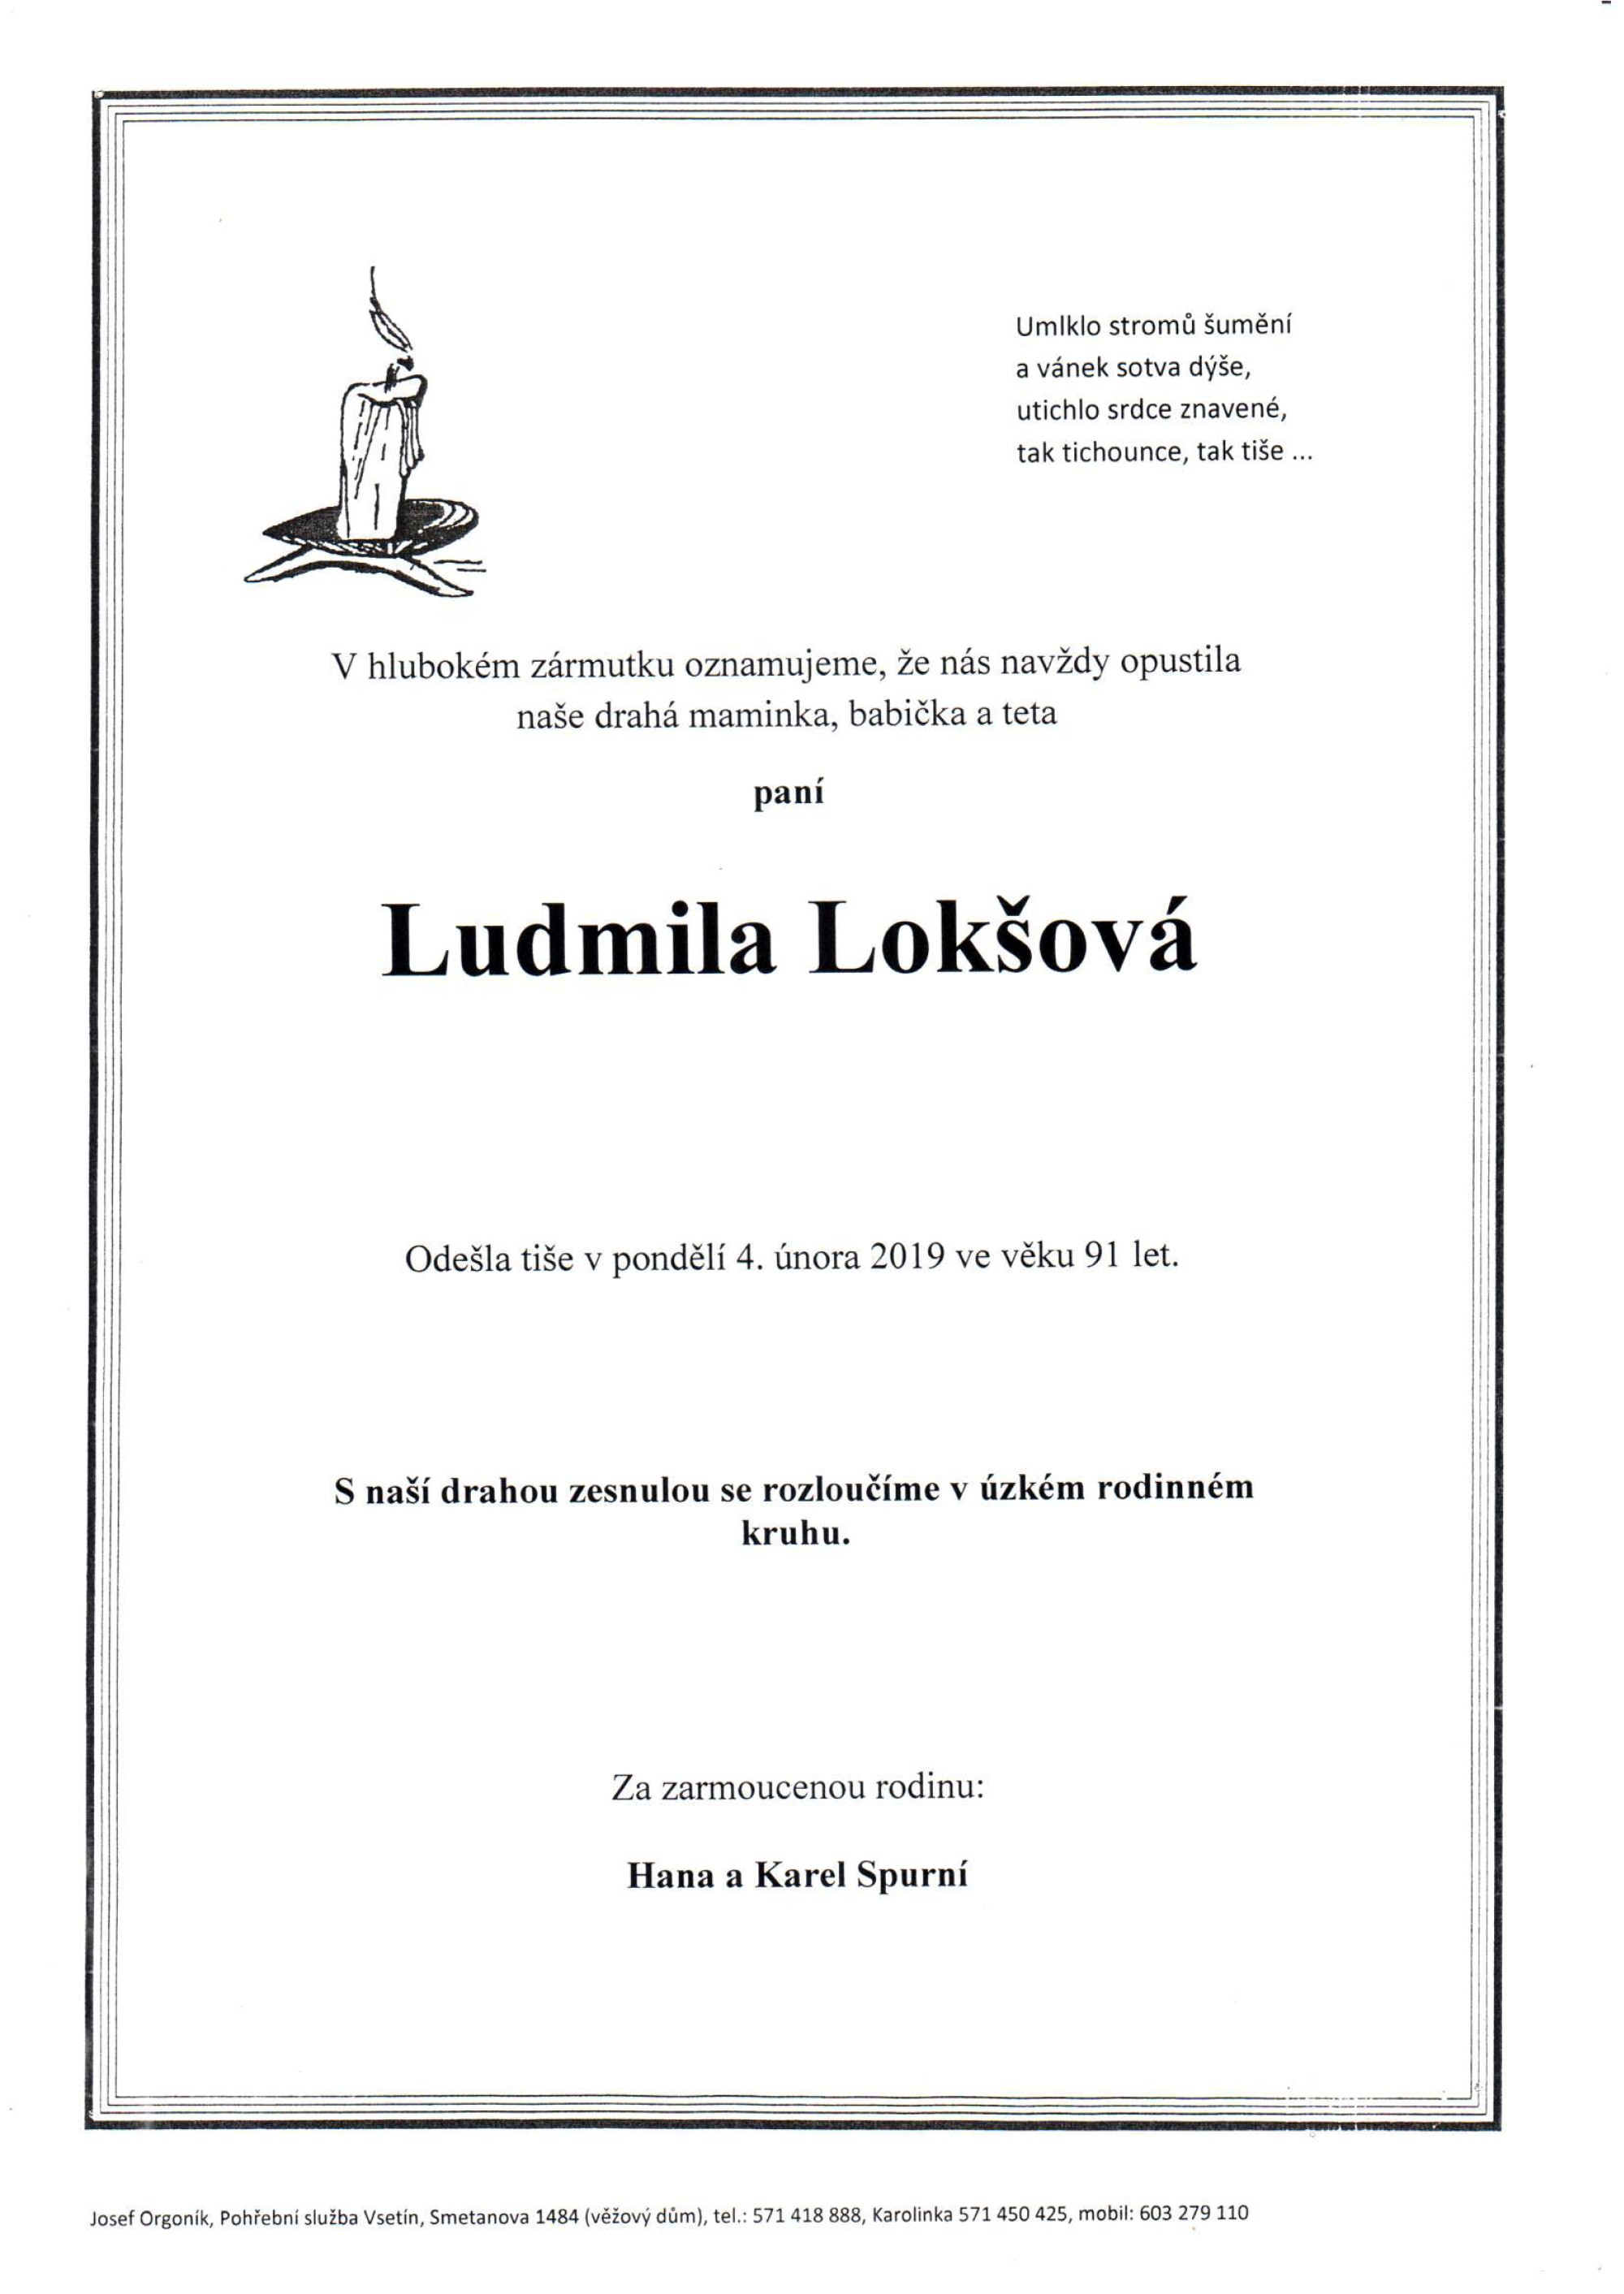 Ludmila Lokšová